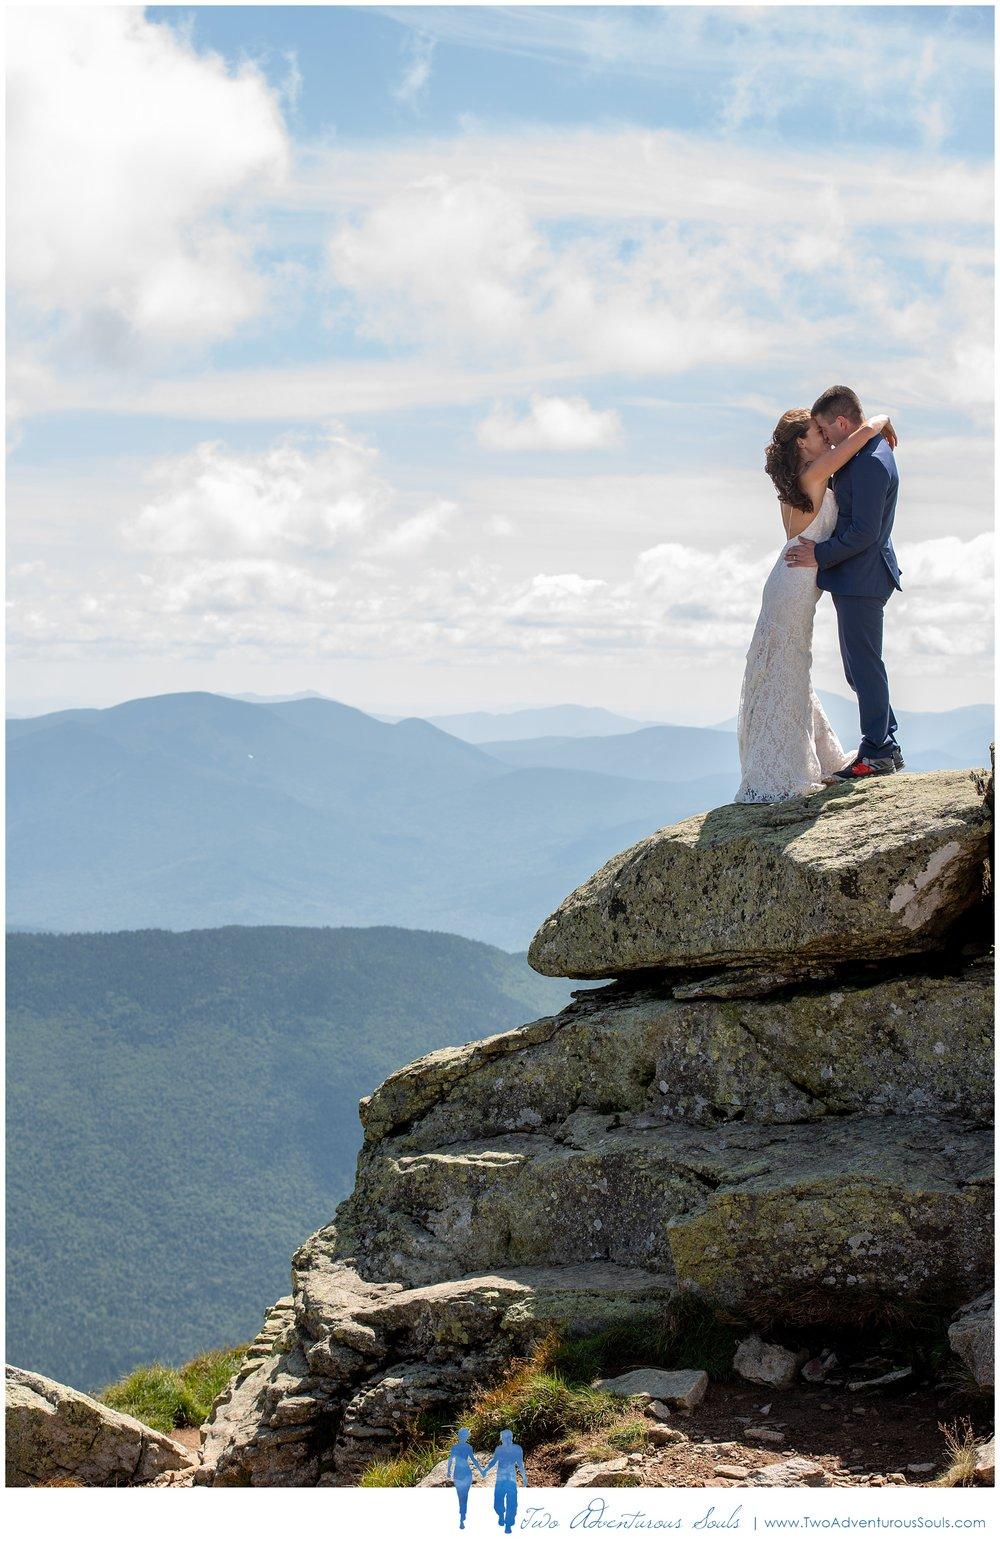 081818 - Chana & Rich - wedding SNEAKS-115_Adventure Wedding, Destination Wedding Photographers.jpg